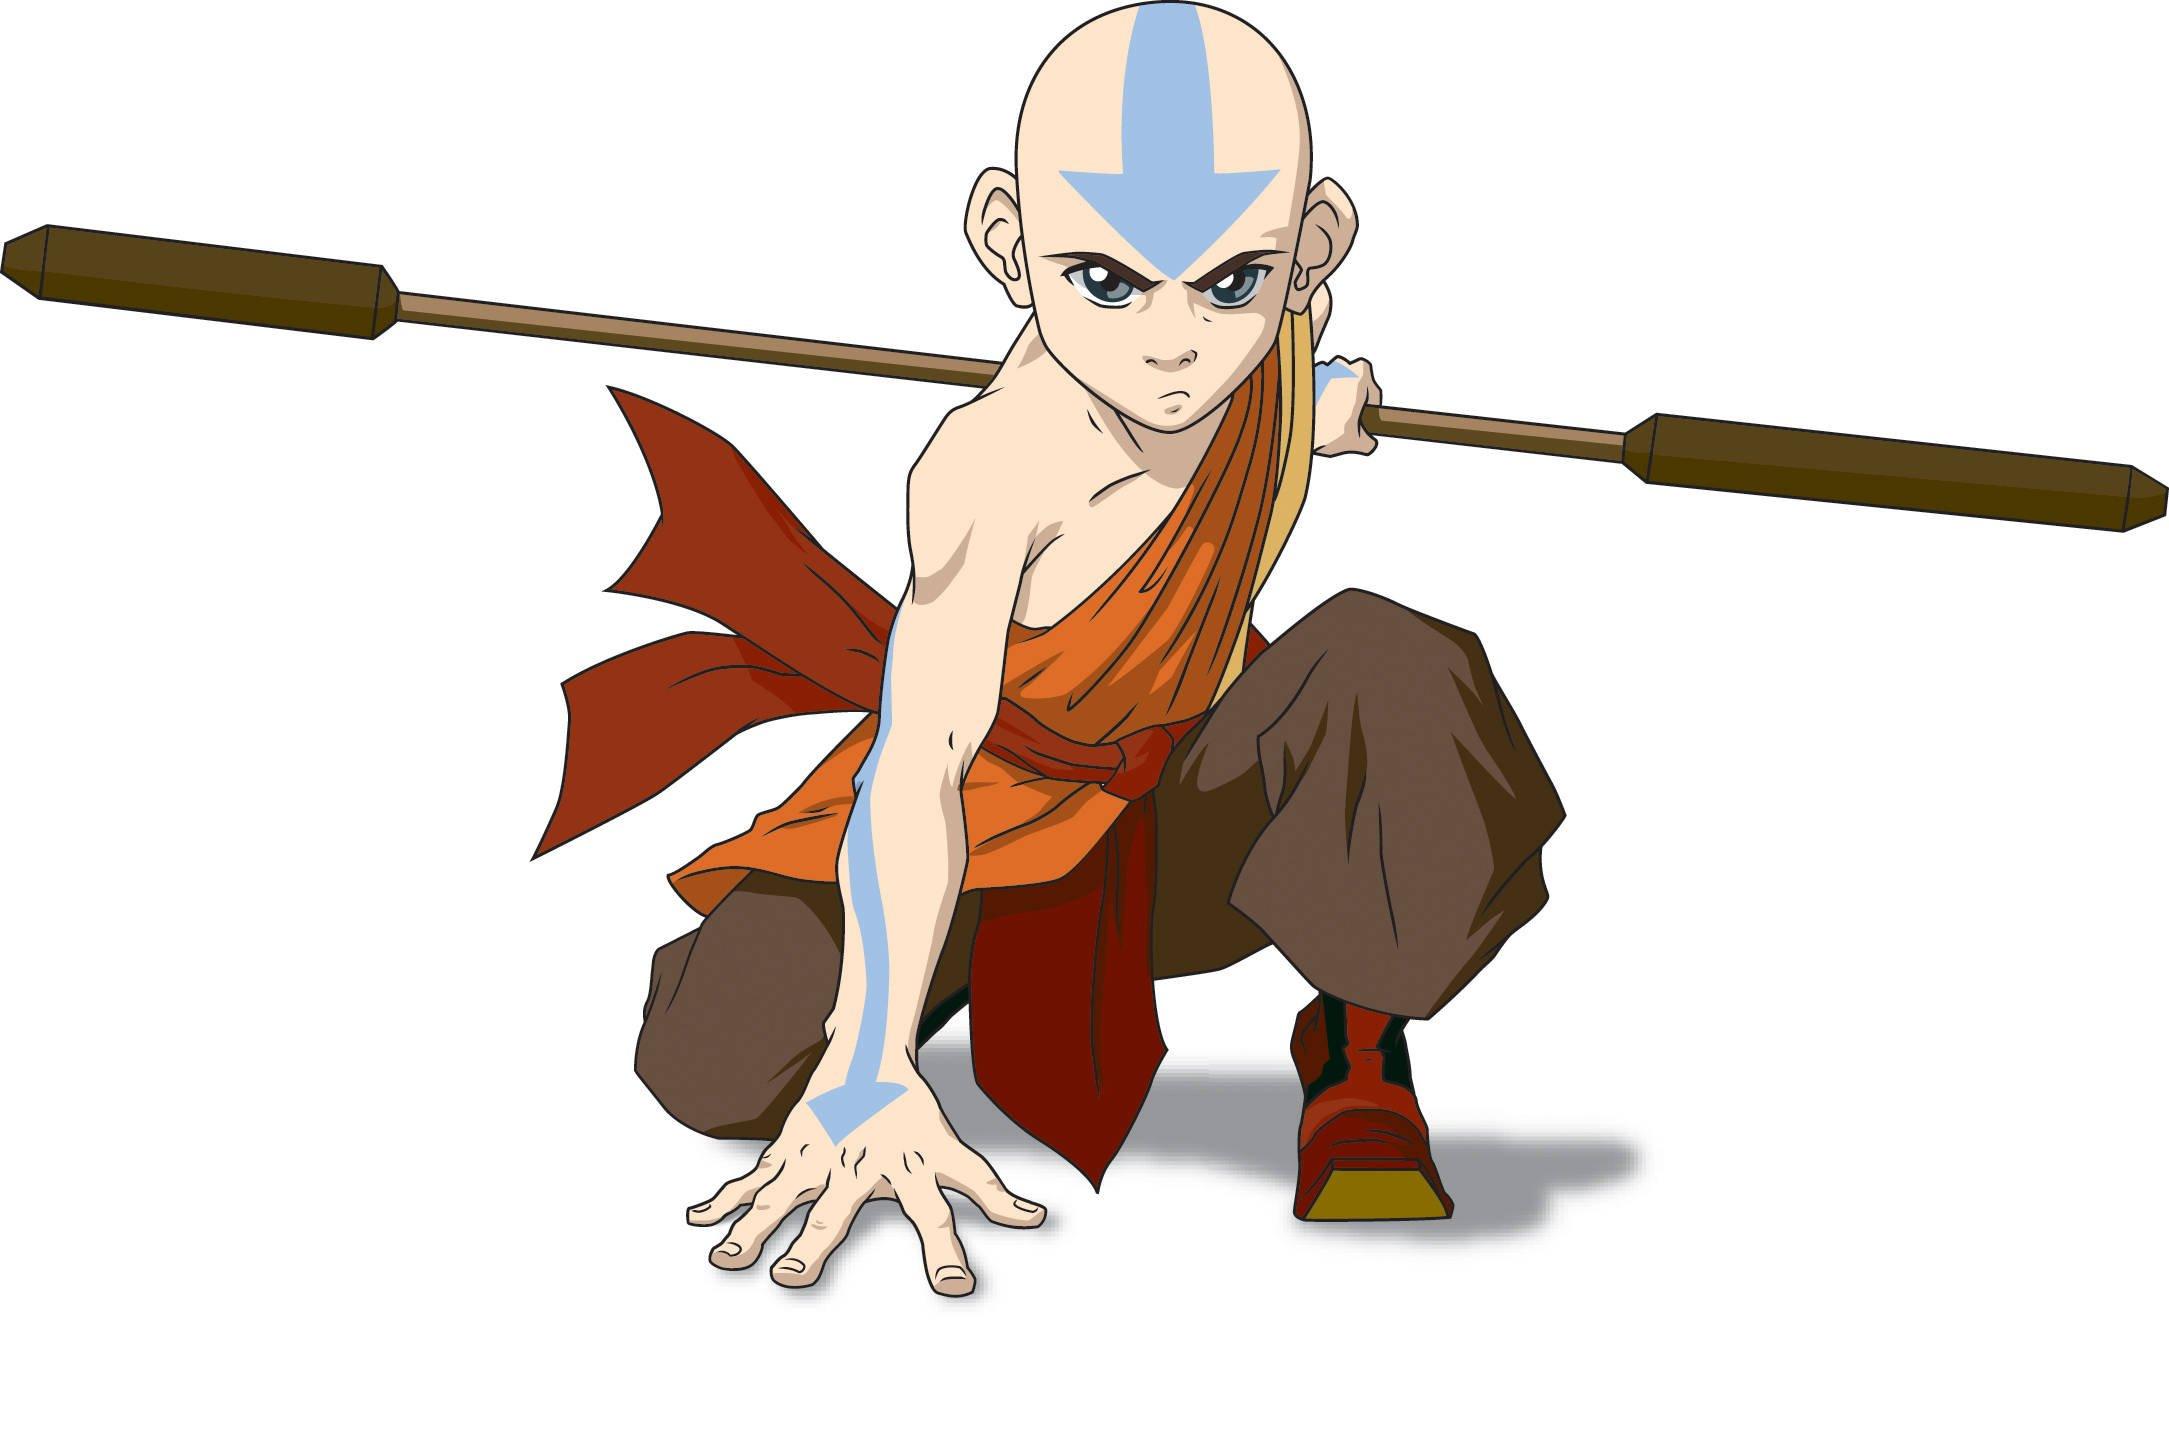 """Avatar: The Last Airbender"" ровно 10 лет с момента выхода на экраны. - Изображение 1"